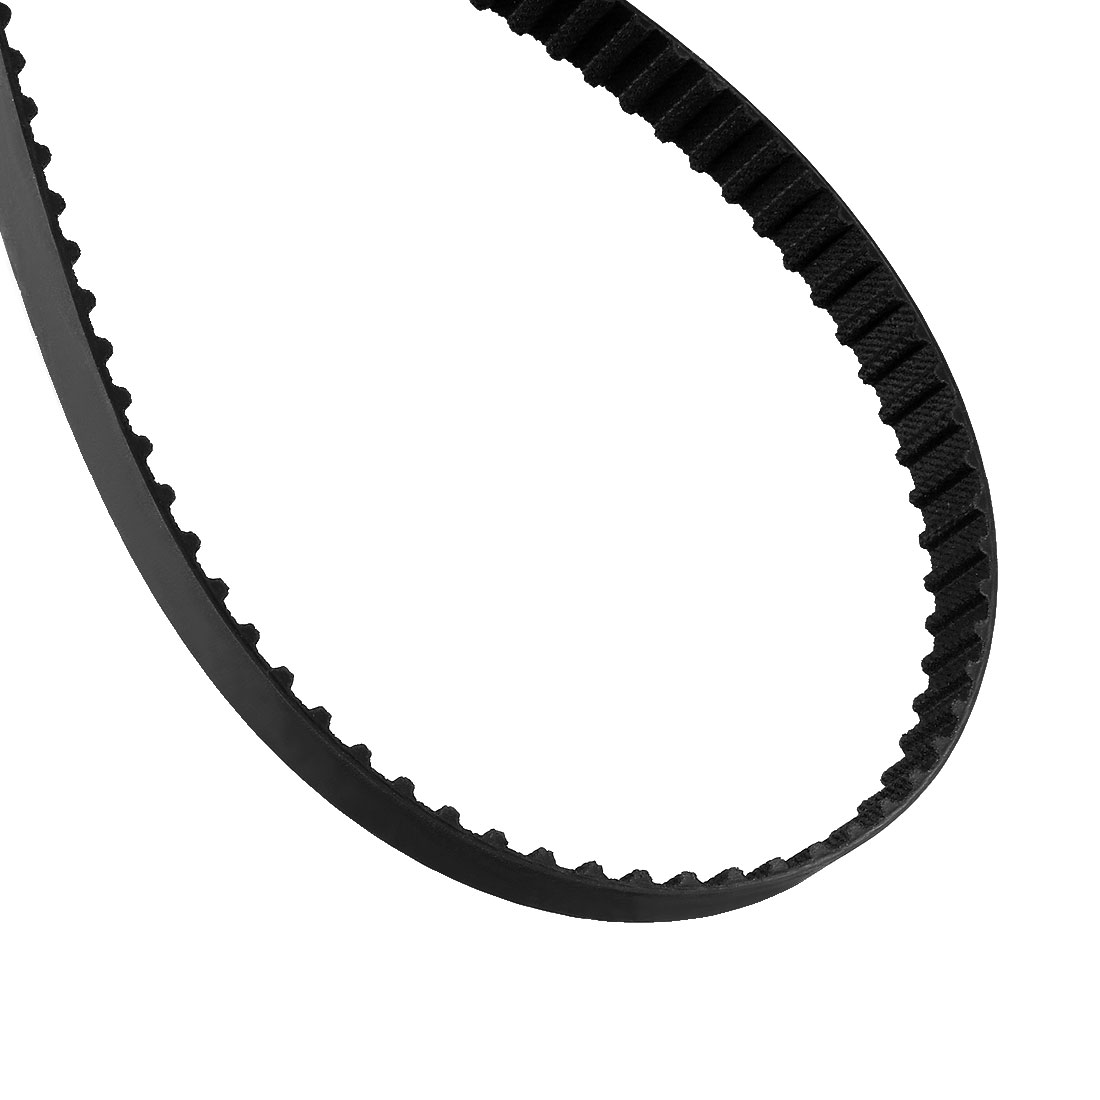 414XL 207 Teeth 10mm Width 5.08mm Pitch Stepper Motor Rubber Timing Belt Black